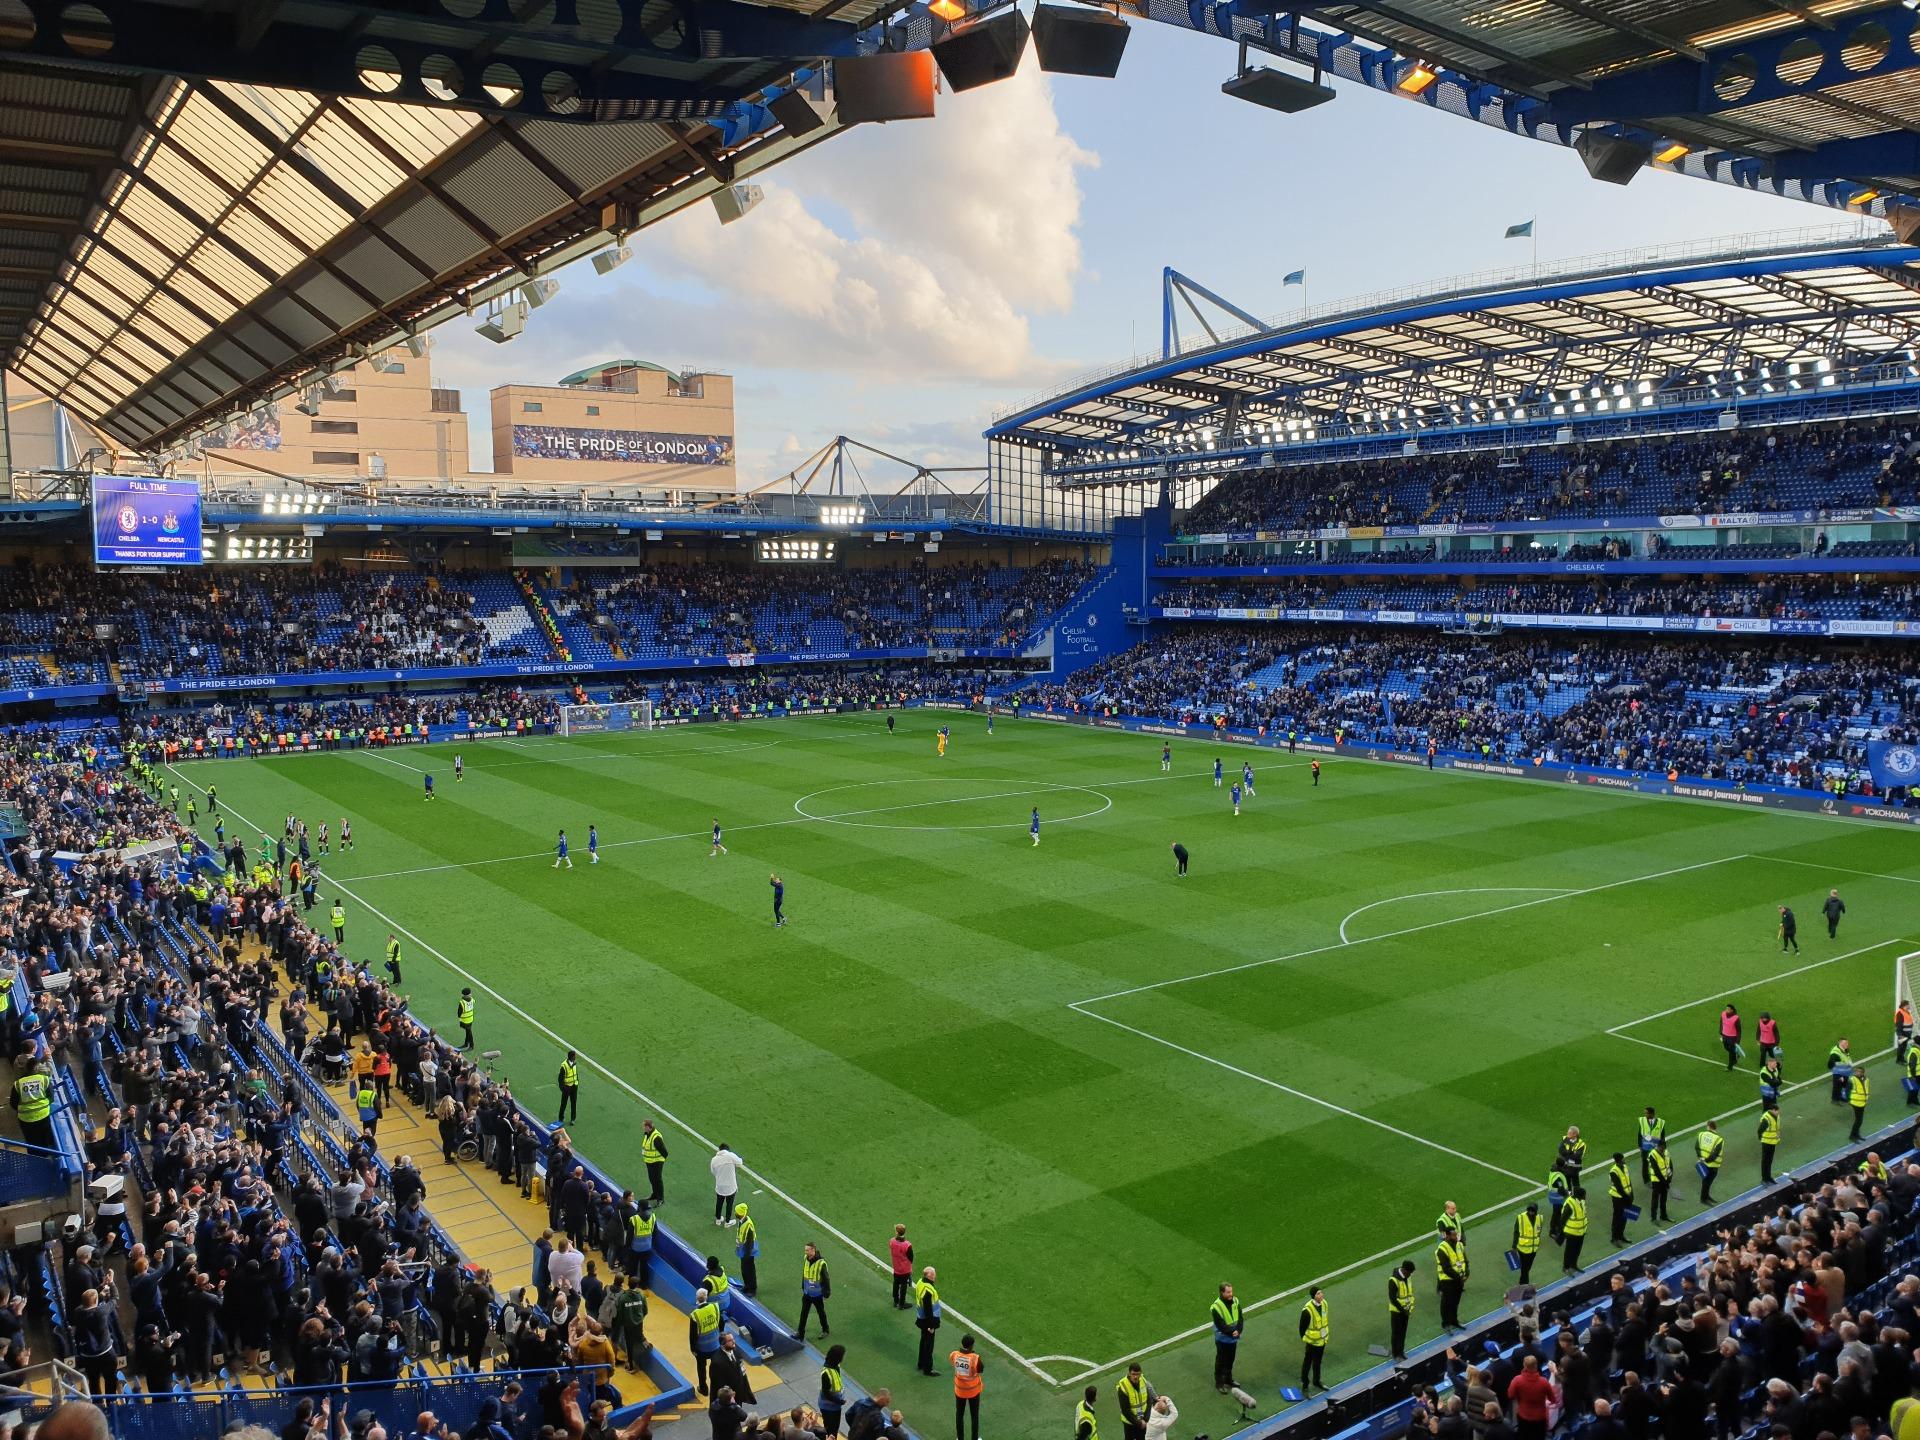 Stamford Bridge Section Matthew Harding Upper 16 Row H Seat 179